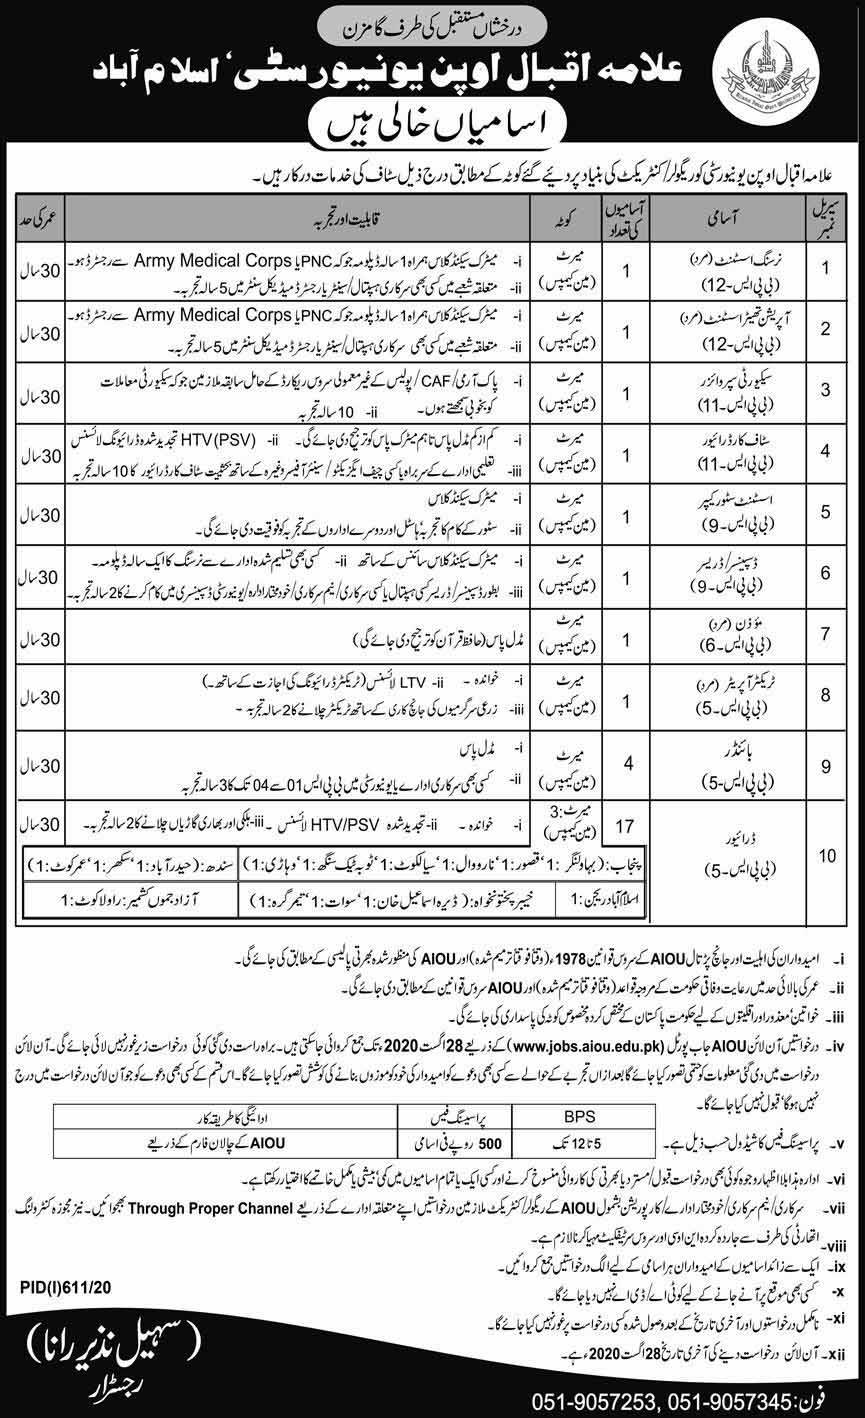 Allama Iqbal Open University Jobs 2020 For Security Supervisor